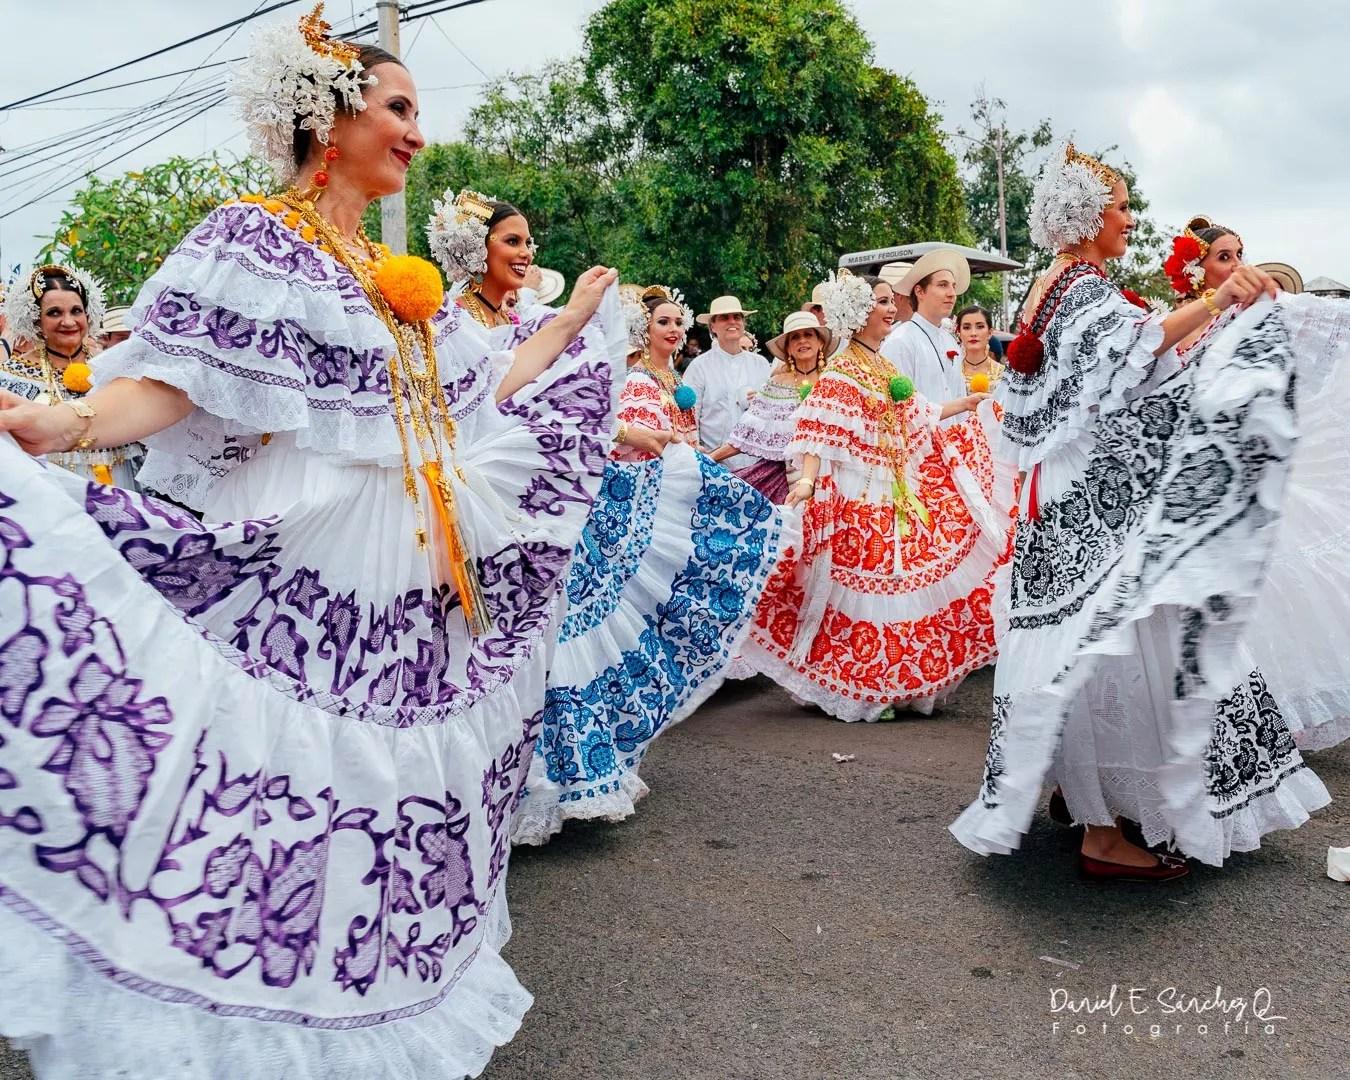 Pollera de lujo - Desfile de las Mil Polleras 2020